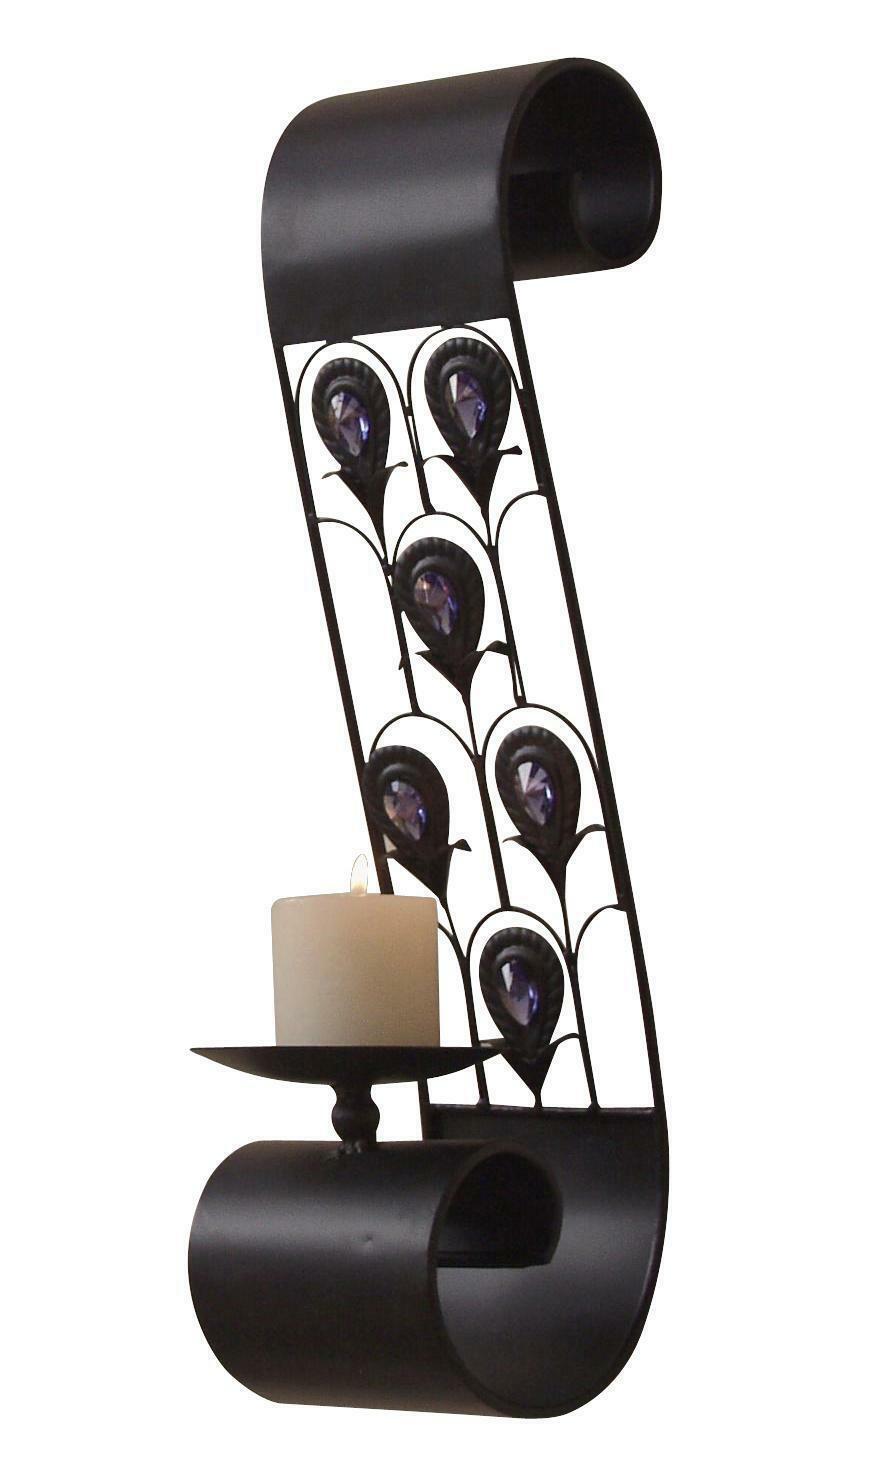 Wandkerzenhalter schwarz 2er-Set Kerzenhalter Wandleuchter Teelichthalter antik